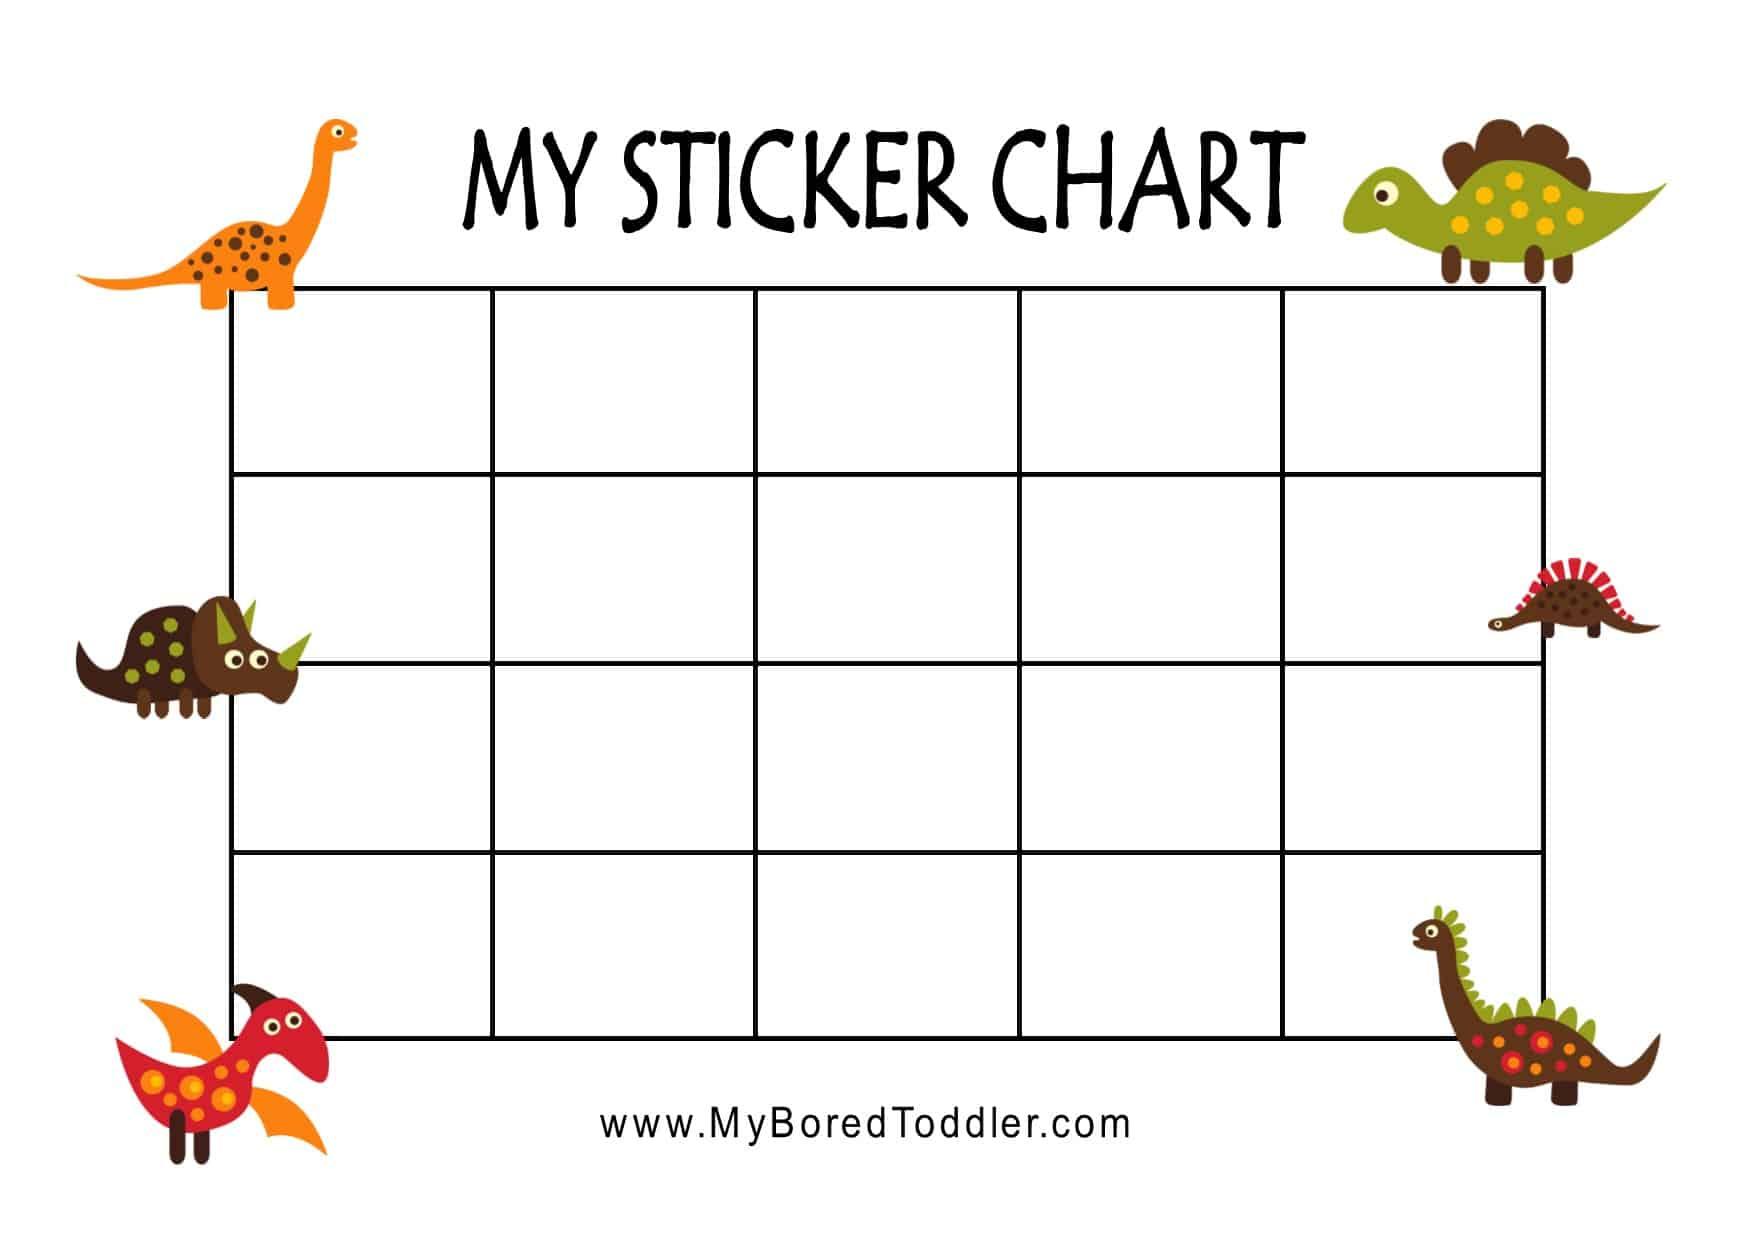 photo regarding Reward Chart Printable referred to as dinosaur printable benefit chart sticker chart for infants